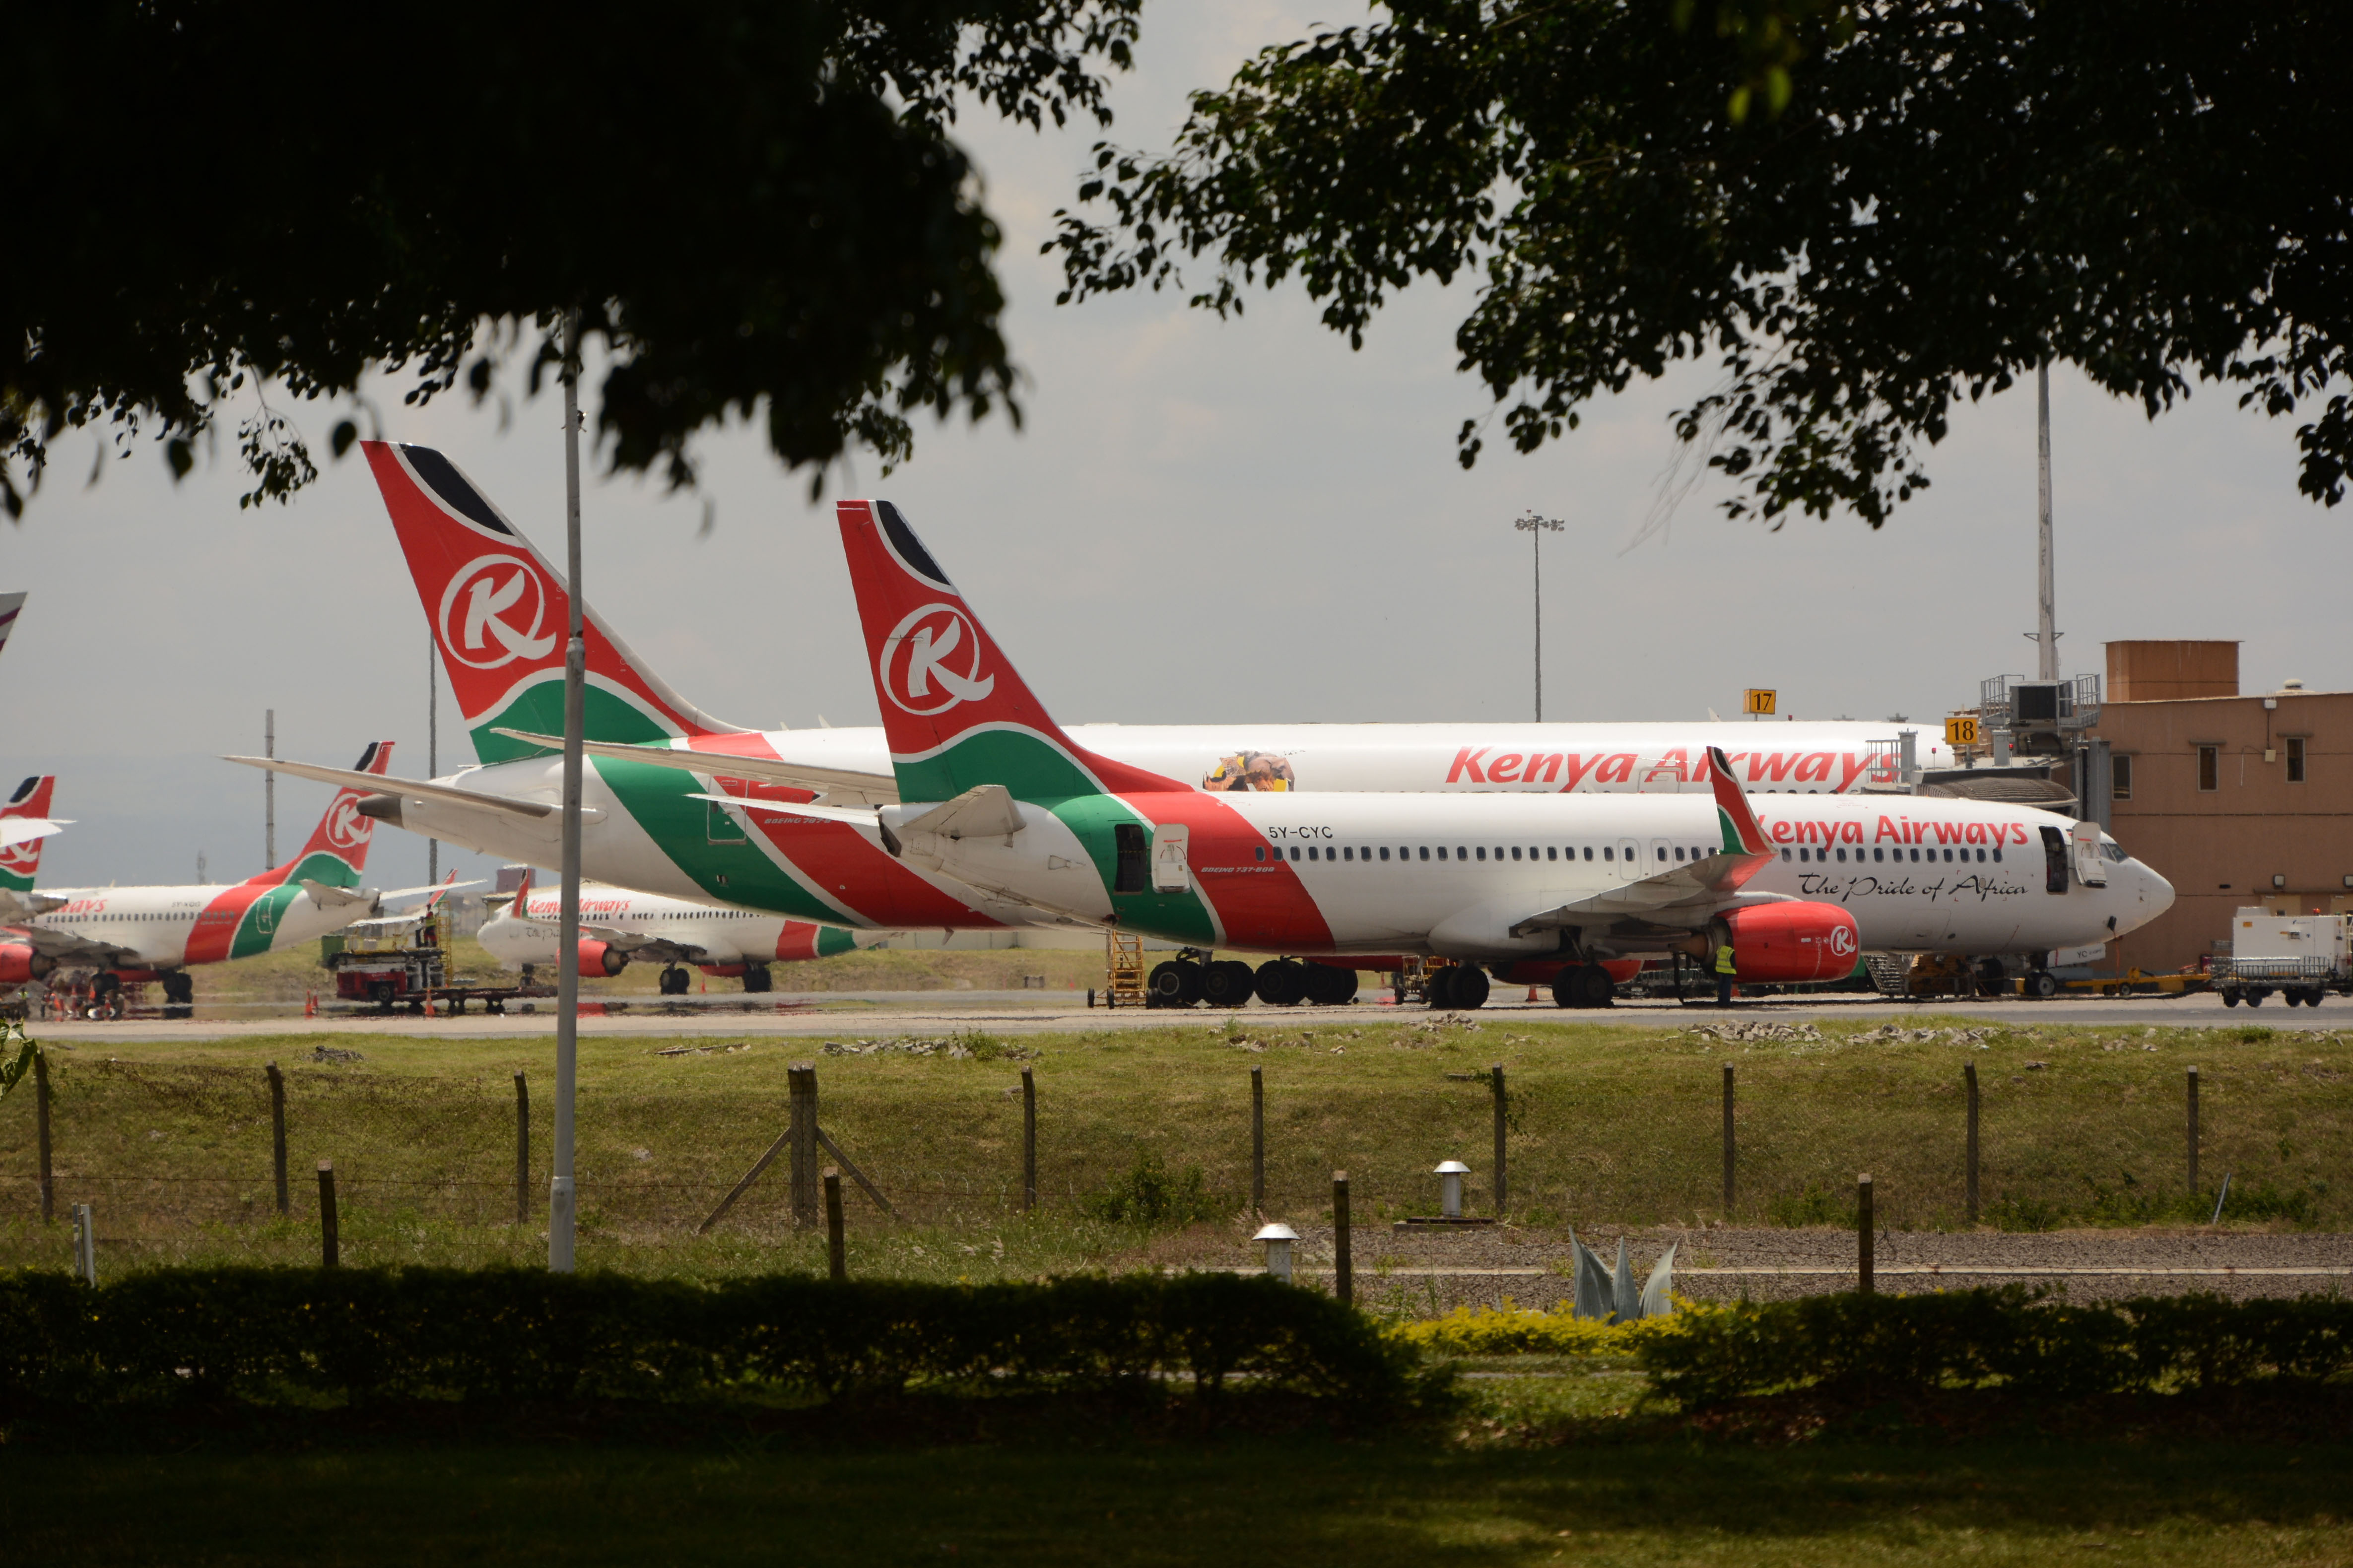 Kenya Airways planes are parked at Jomo Kenyatta International Airport in Nairobi on March 25.